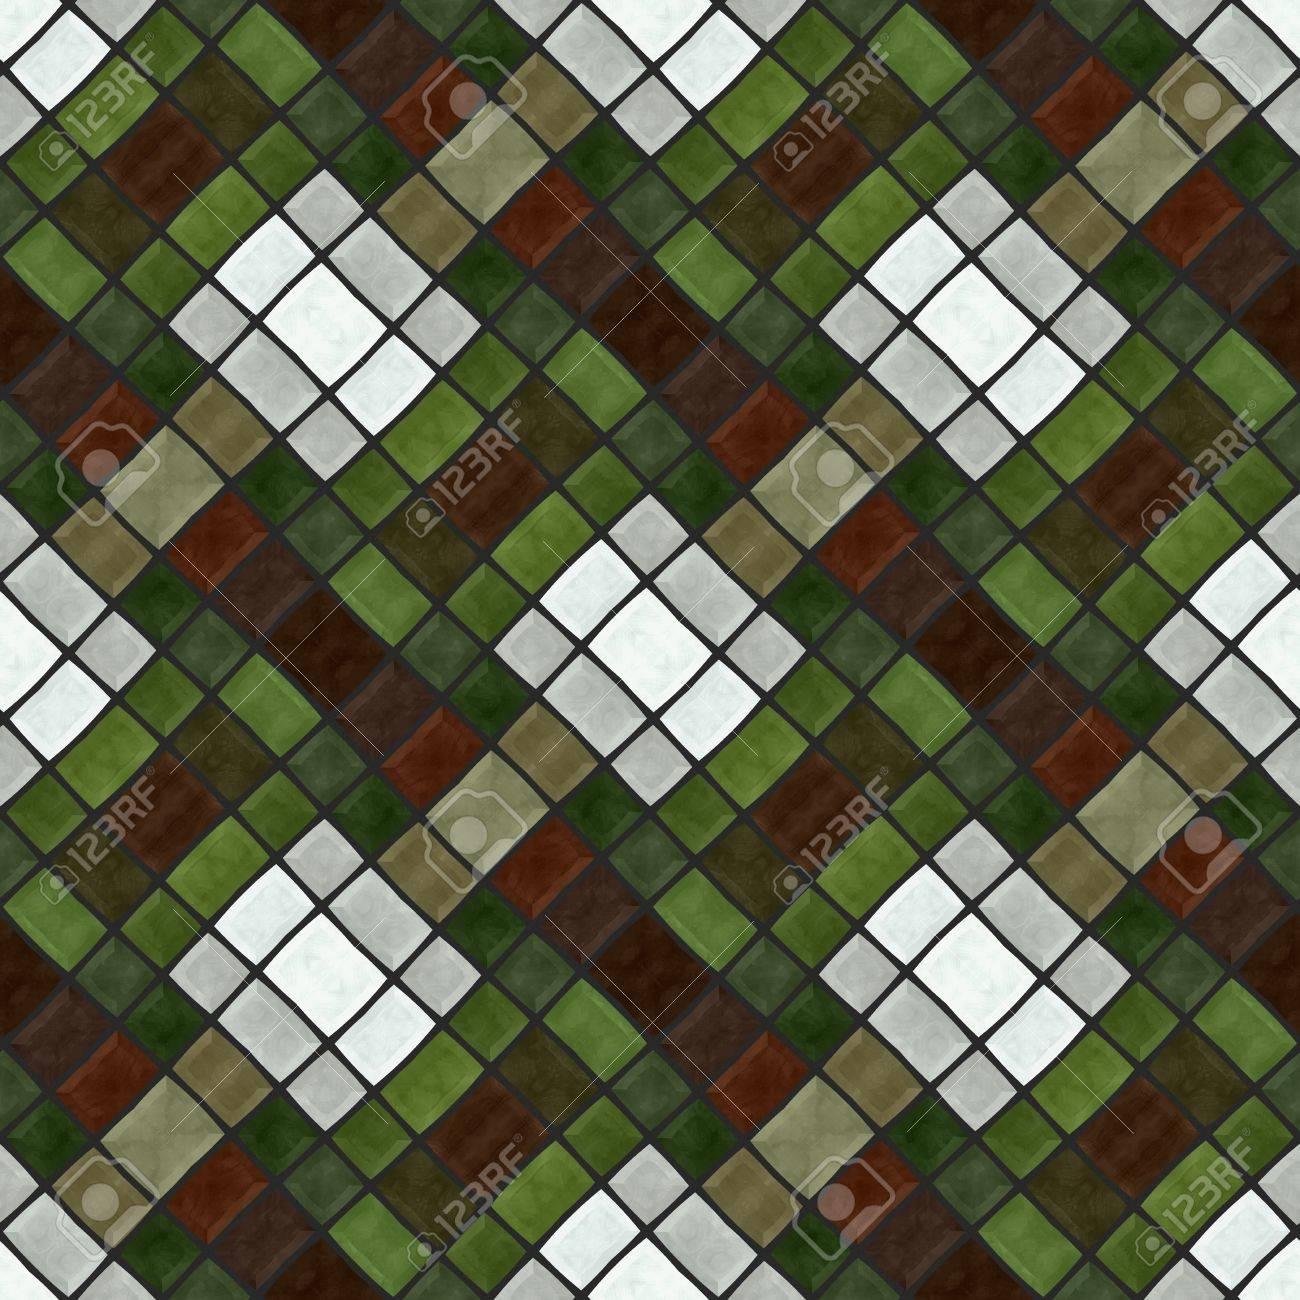 Zusammenfassung Karierten Grun Braun Weiss Grau Mosaik Fliesen Muster